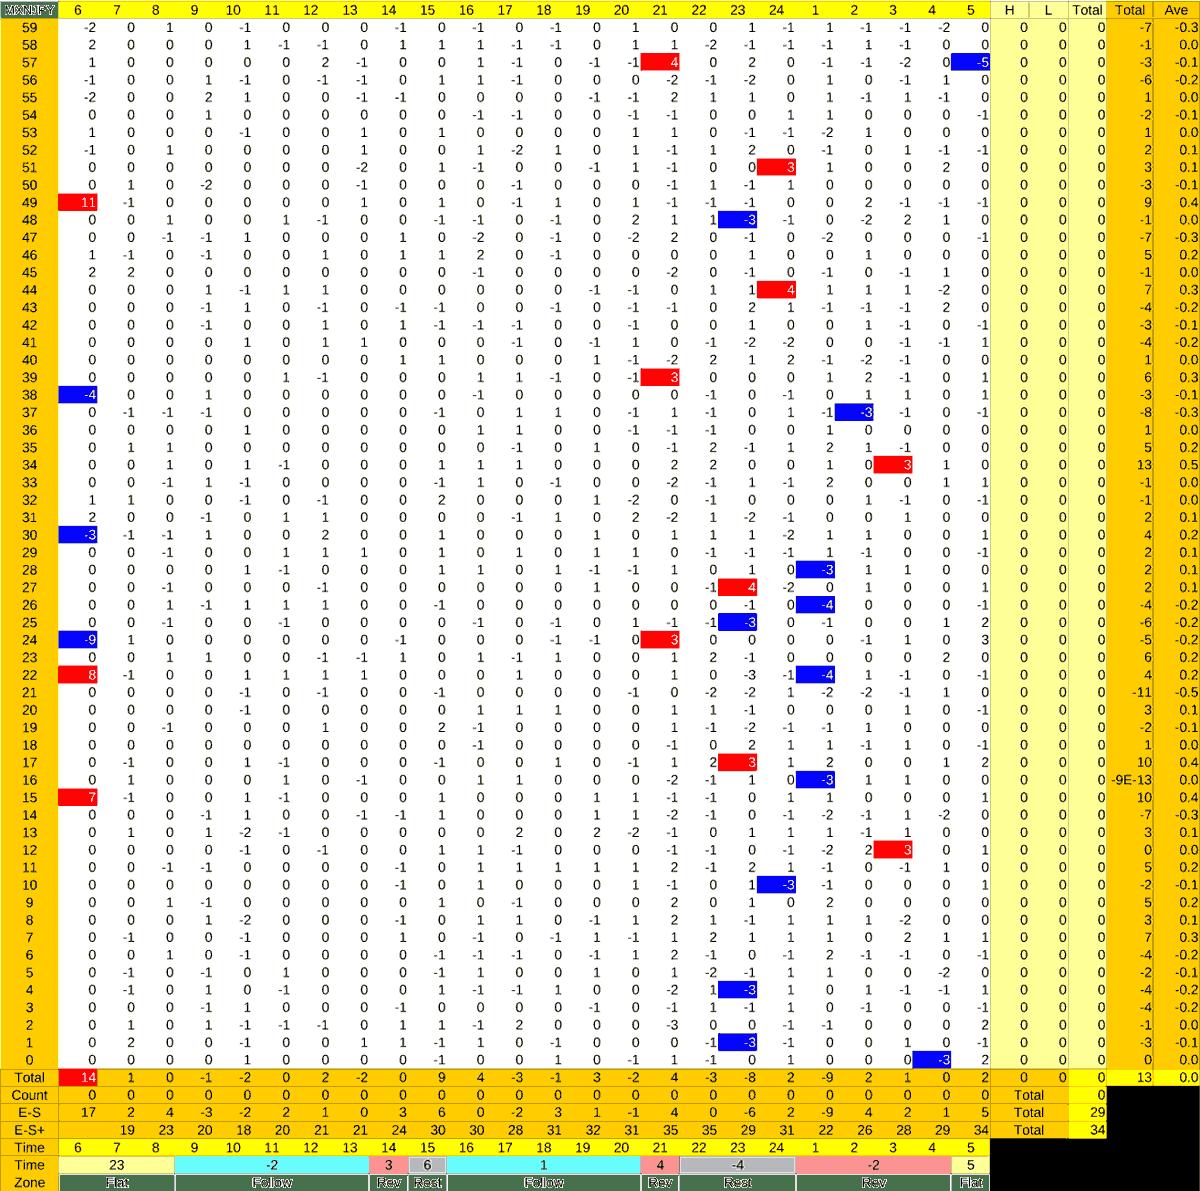 20210527_HS(3)MXNJPY